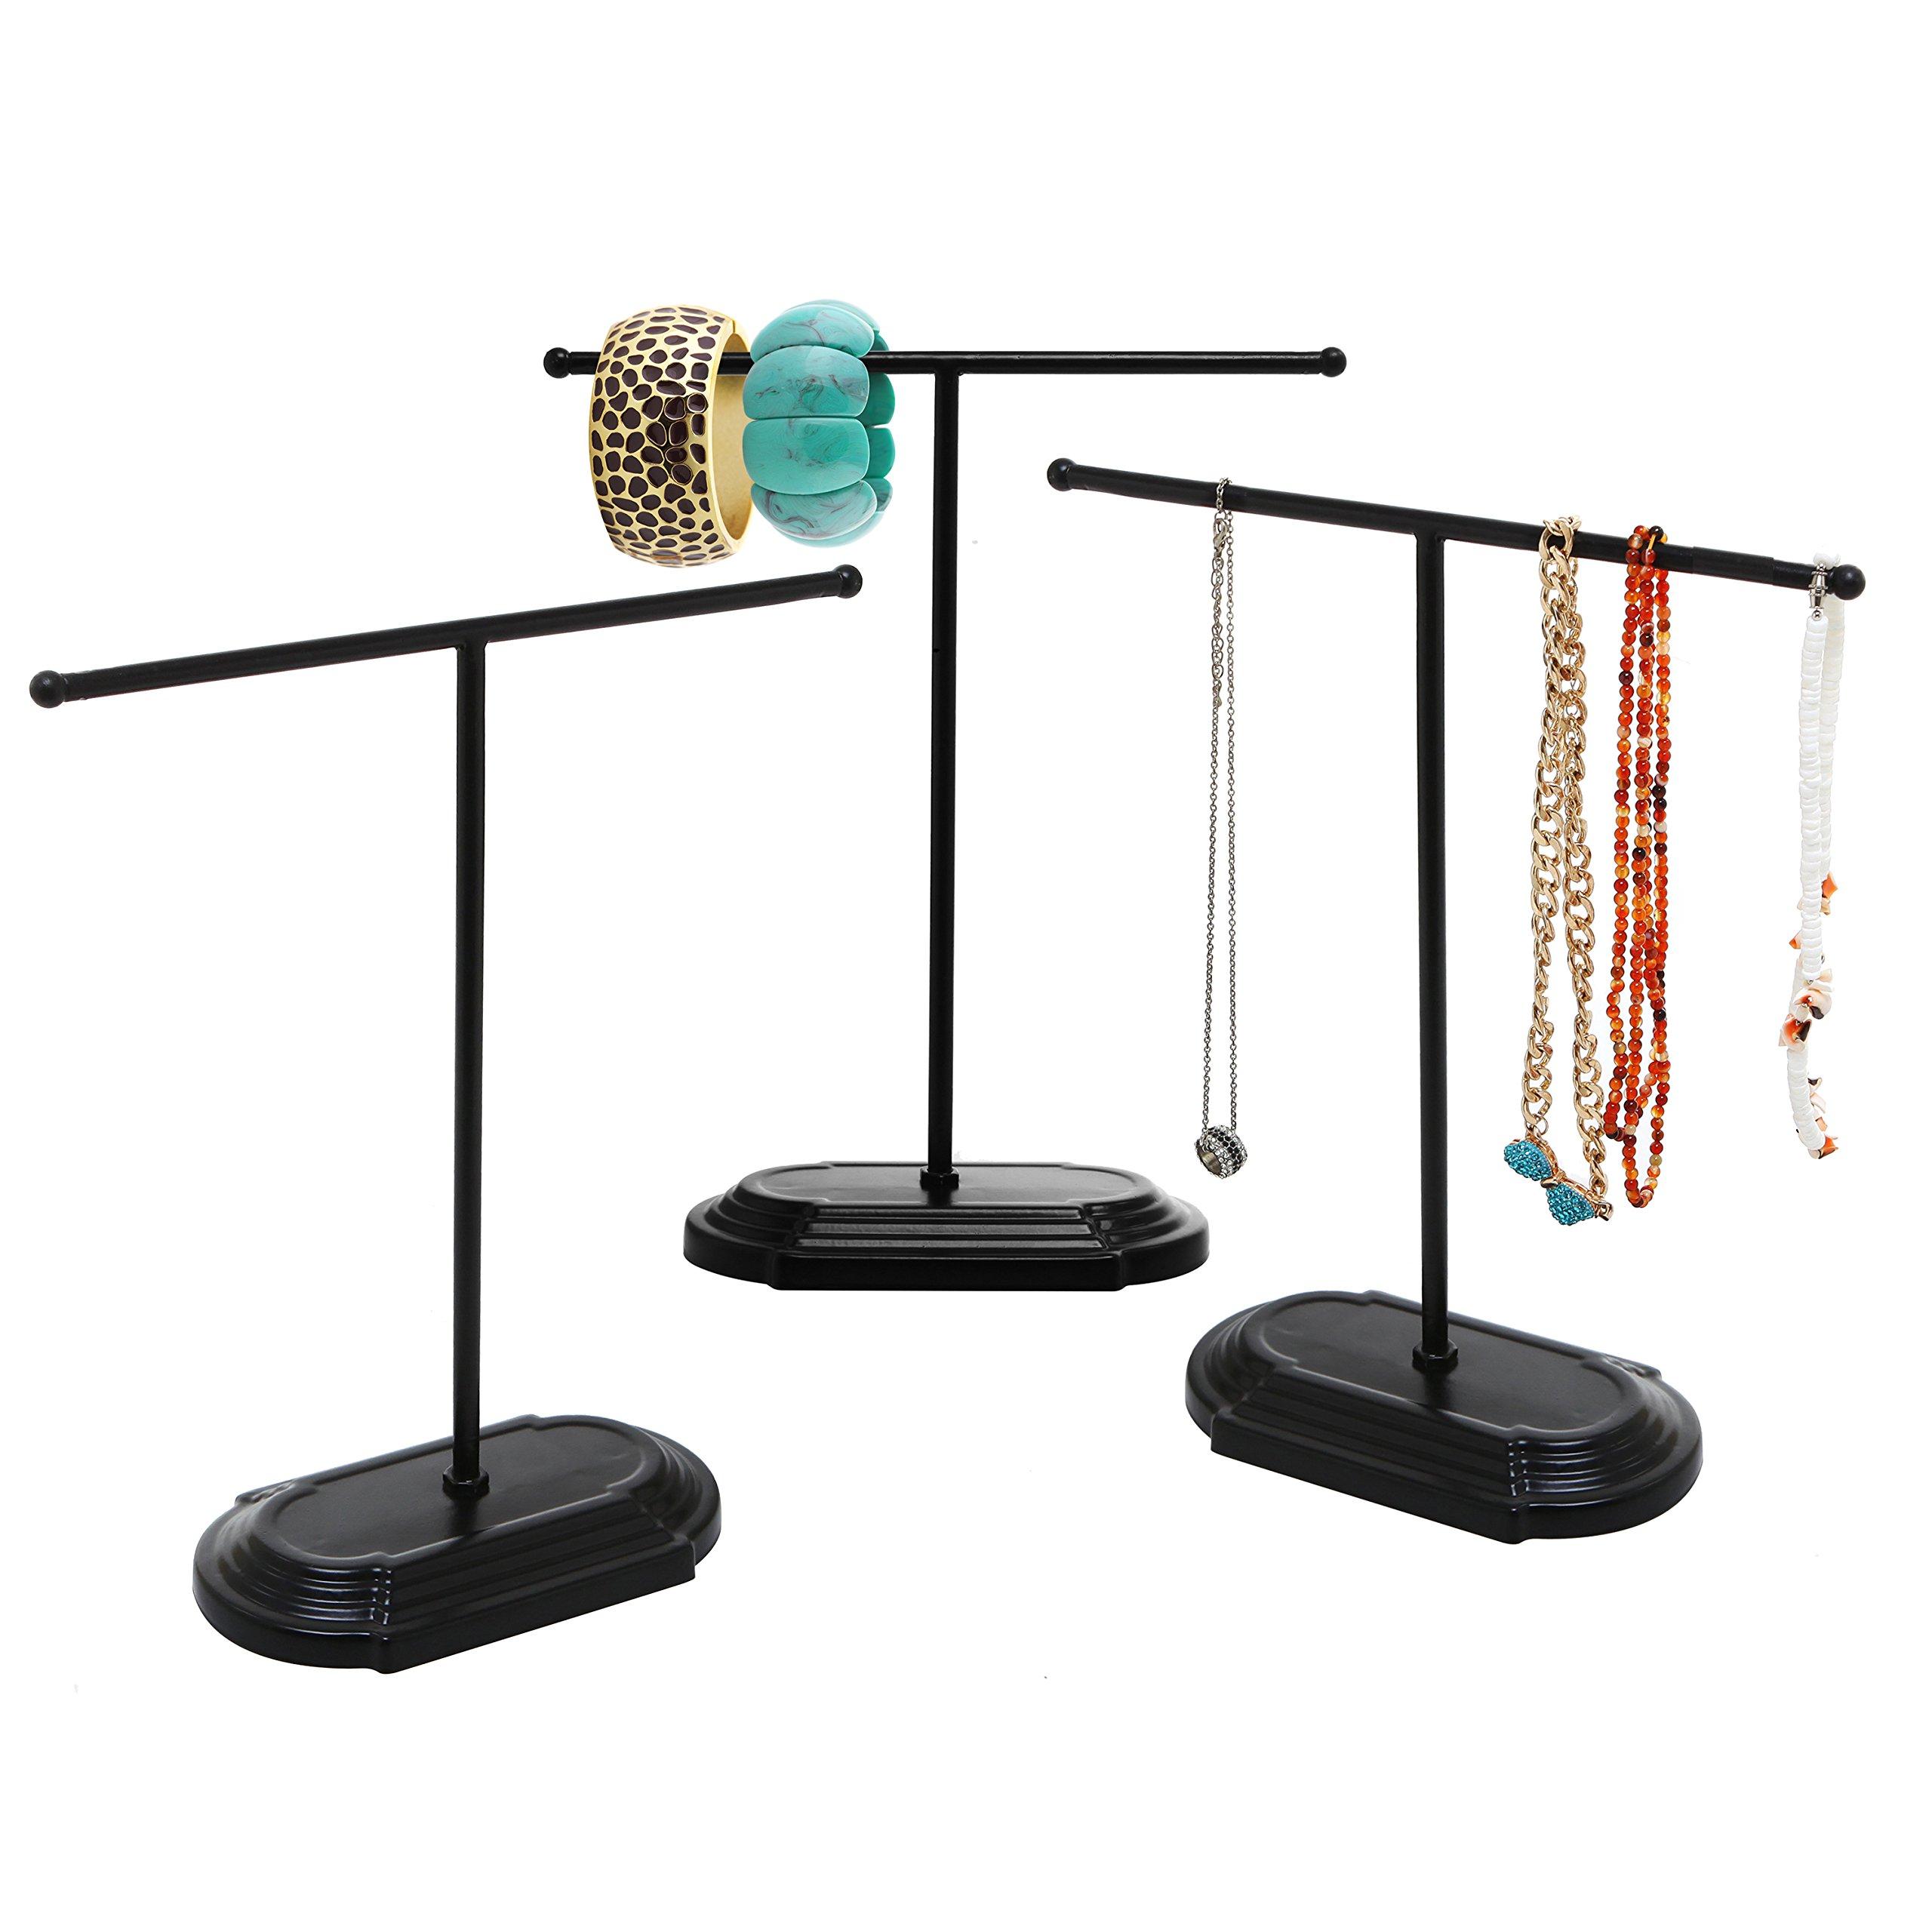 Modern Design Matte Black T-Bar Jewelry Tree Display Stands Organizer w/Square Base, Set of 3